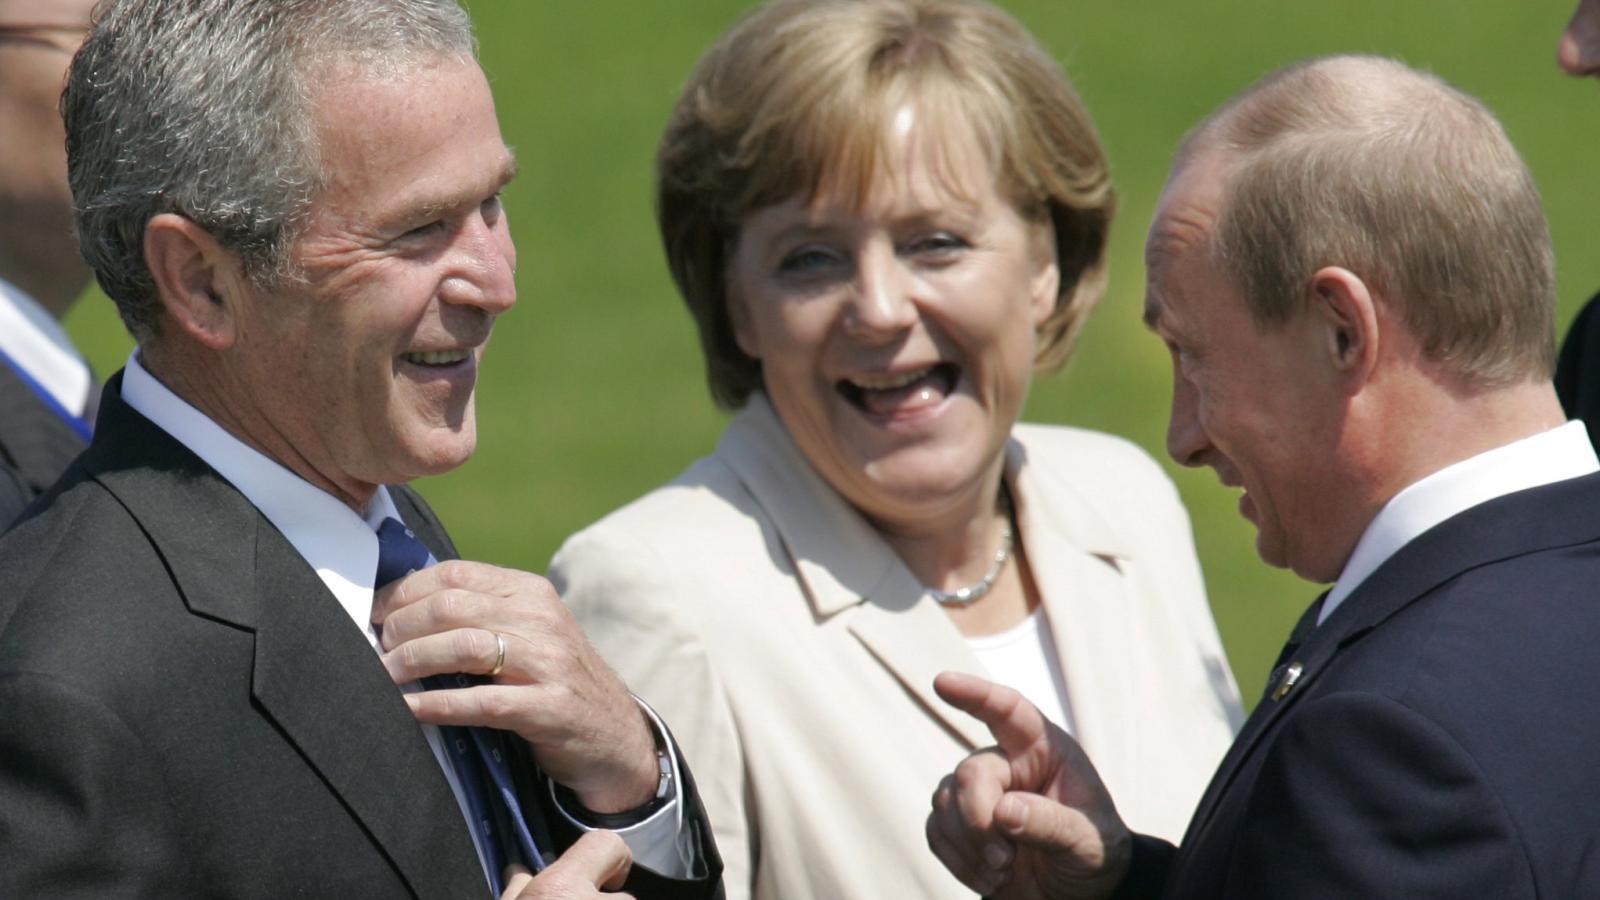 Declassified Cia Soviet Jokes Offer A Glimpse Of Cold War Humor